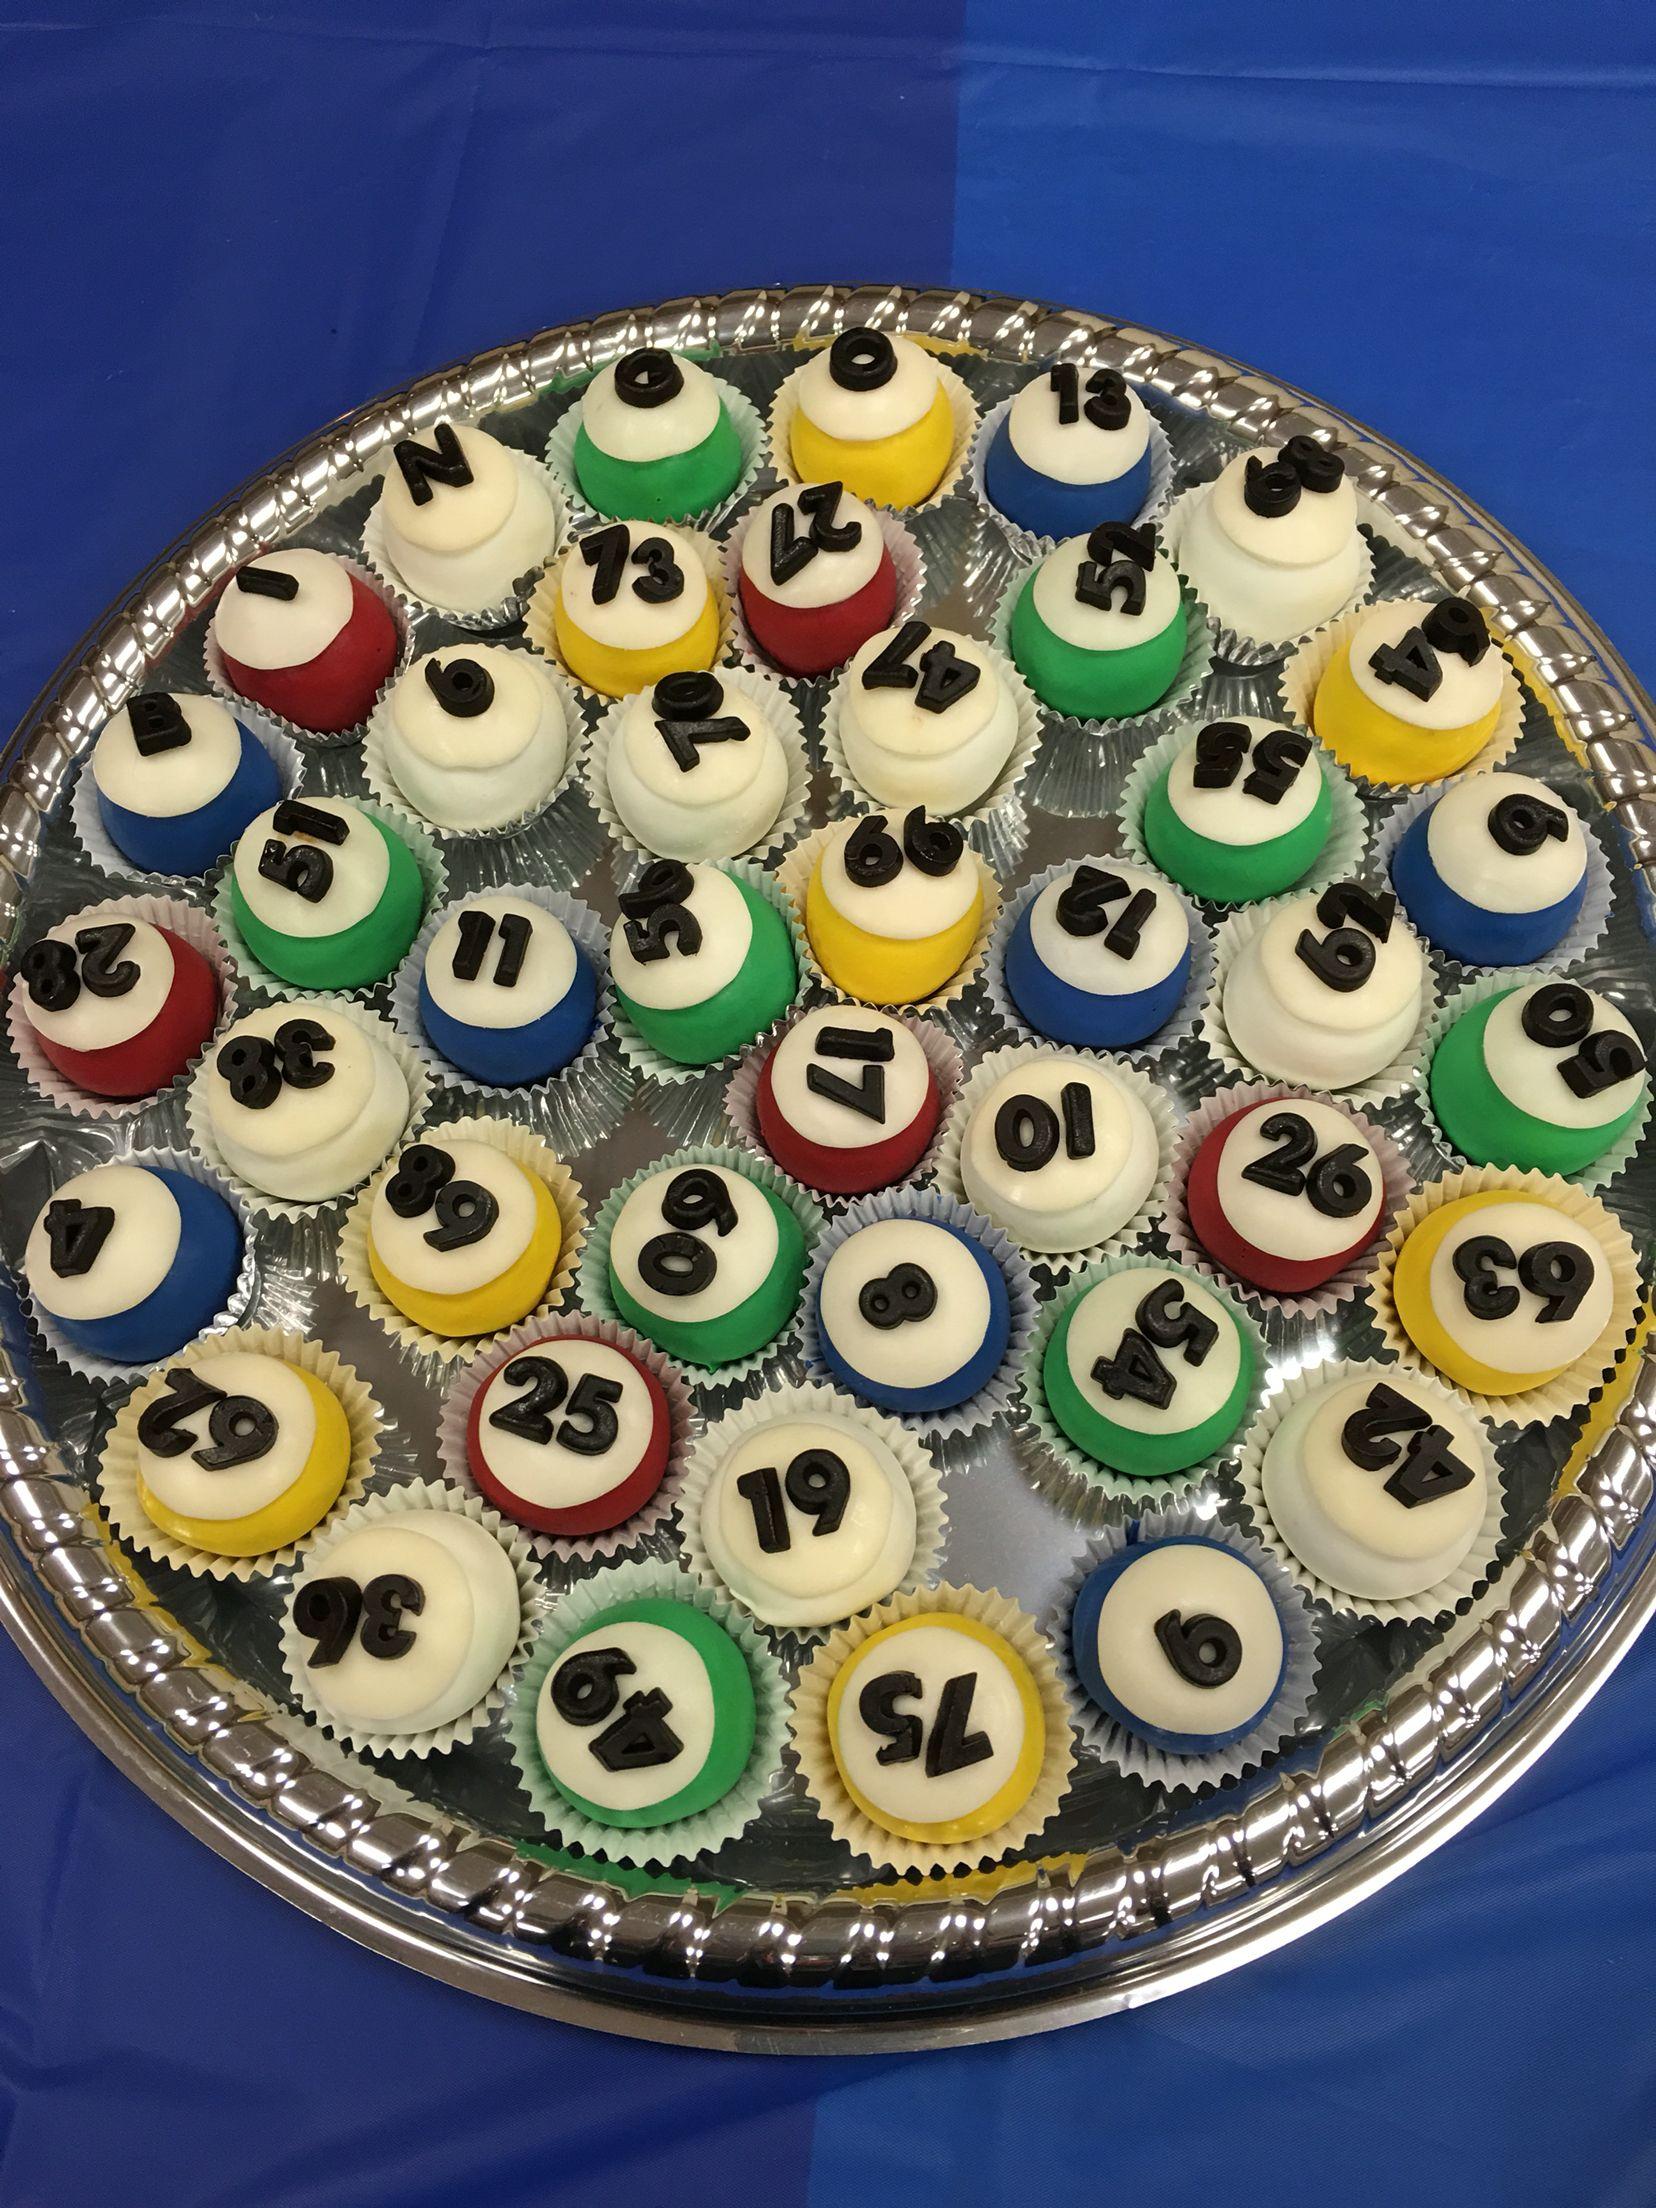 Bingo themed party bingo oreo balls with images